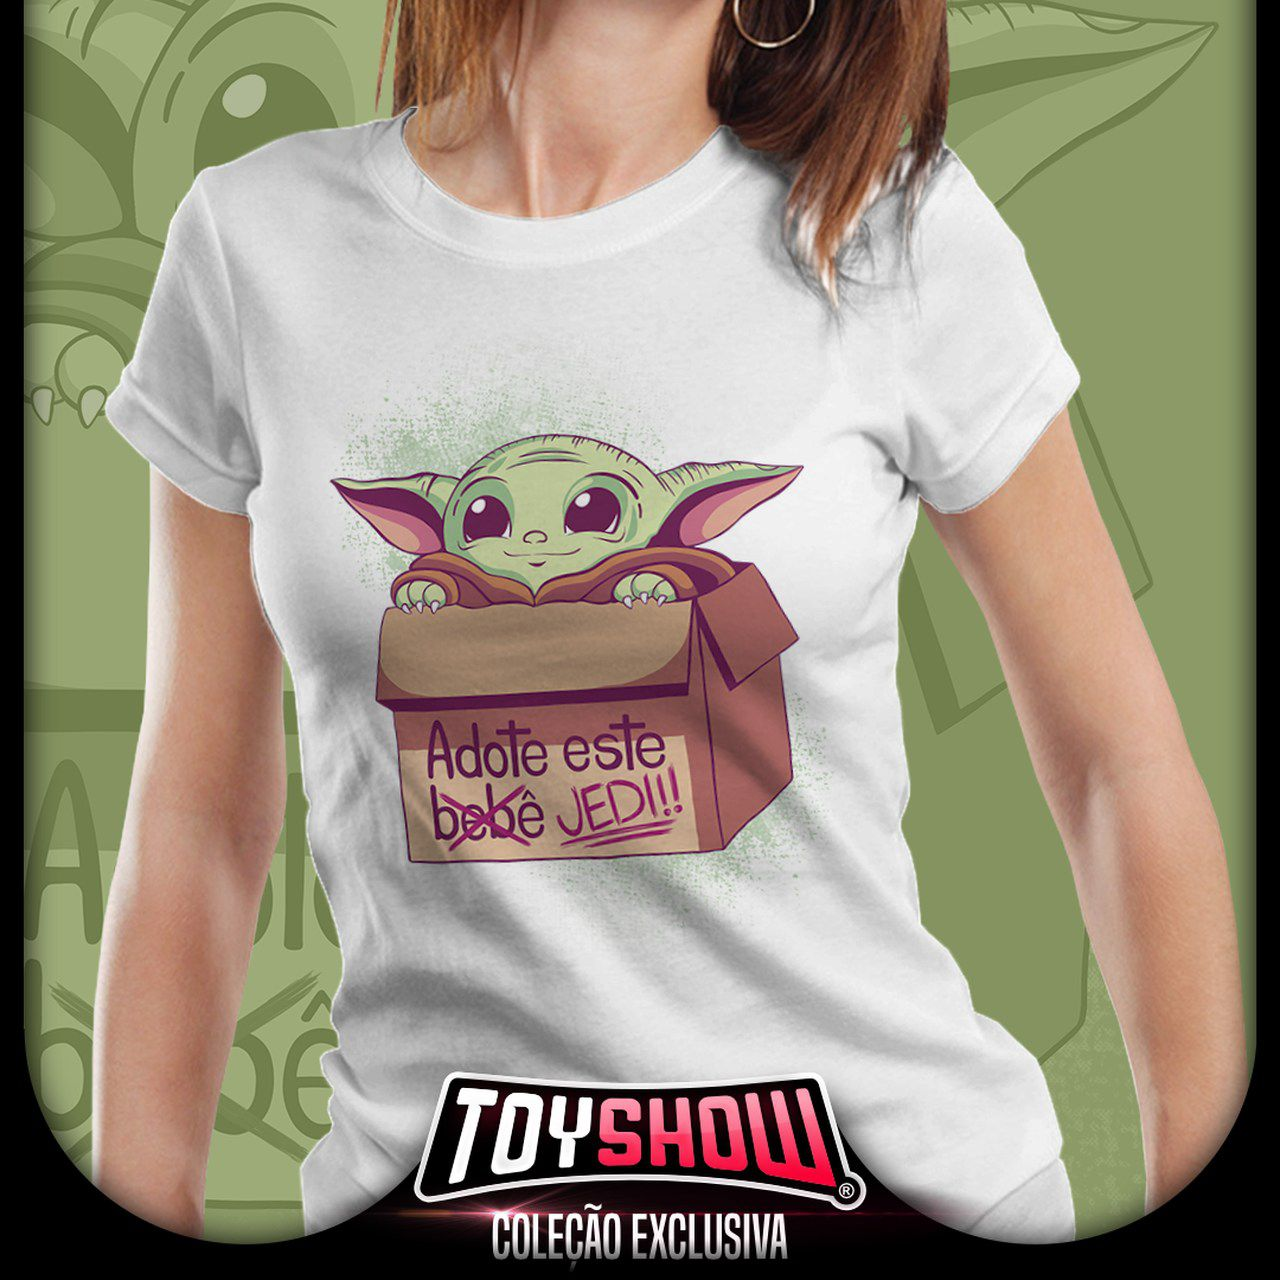 Camiseta Feminina Baby Yoda (The Child)